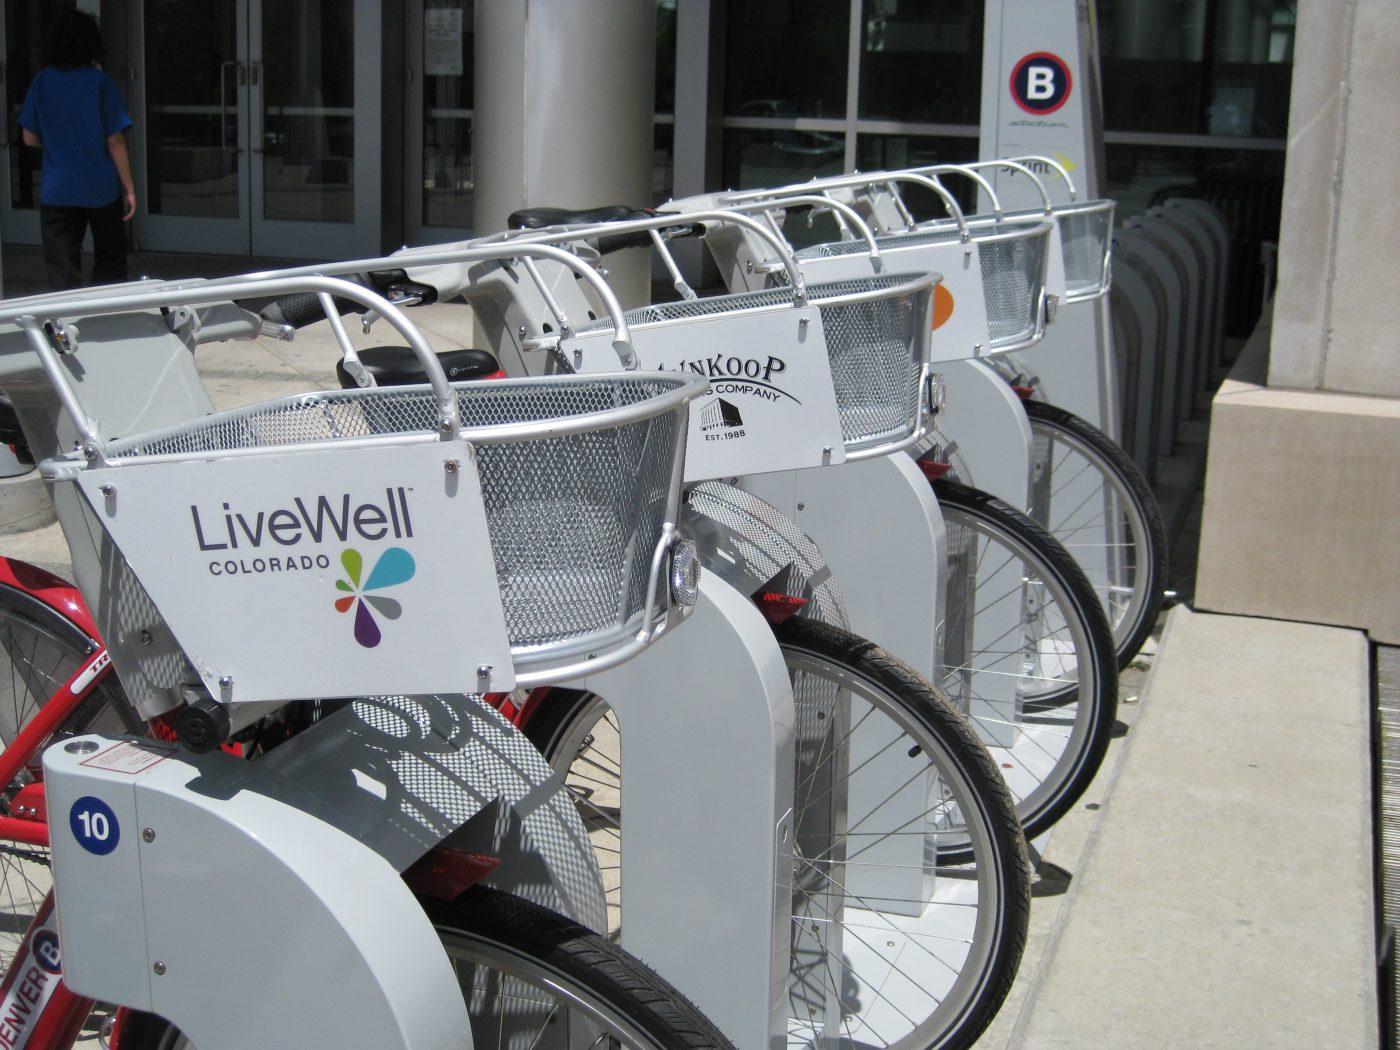 B-cycle bike share Denver